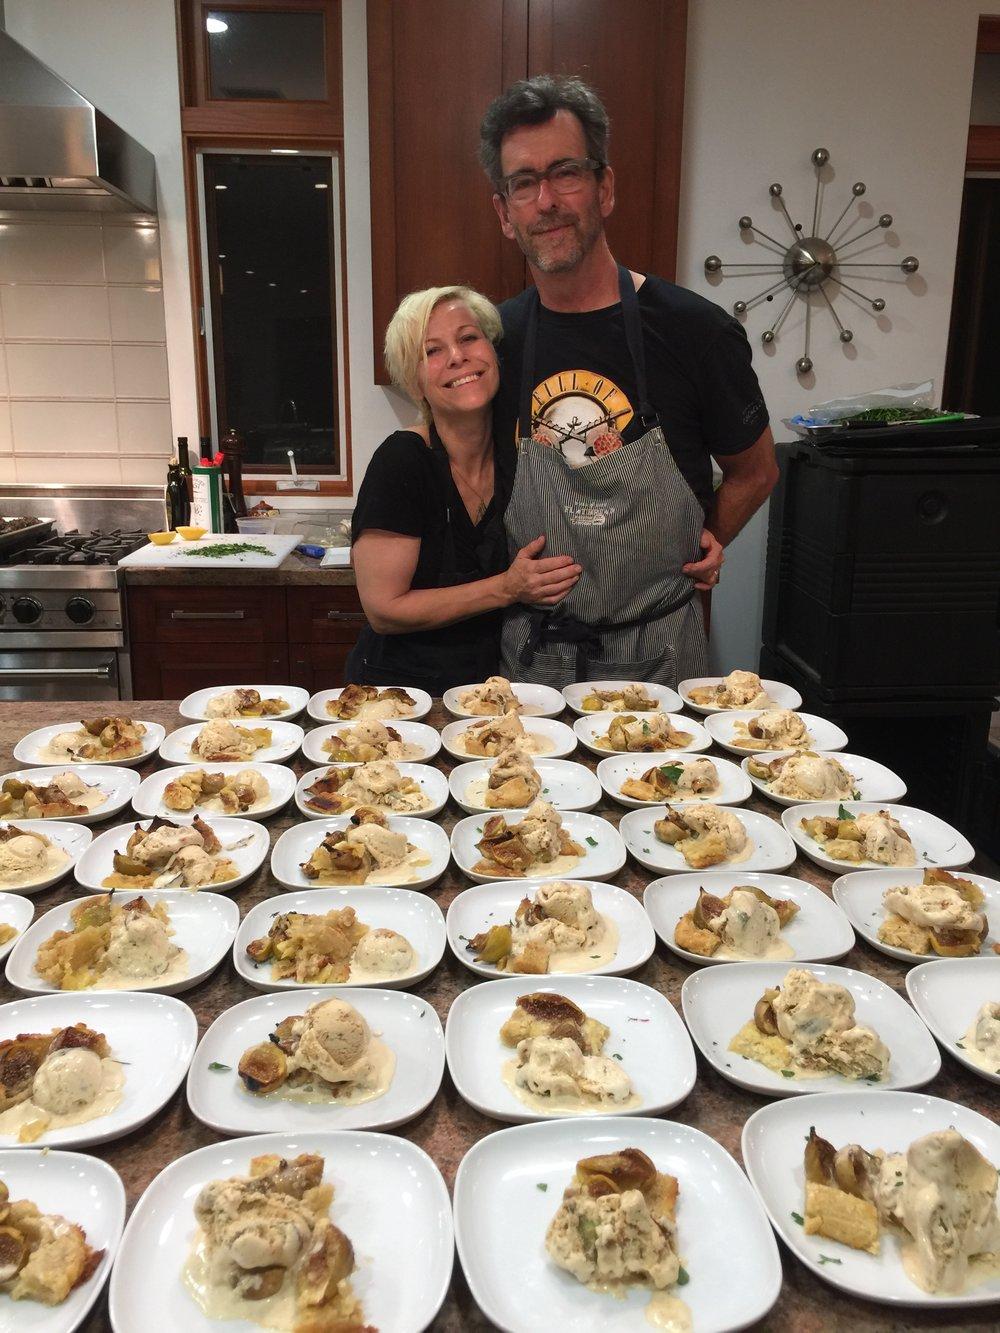 Clark Staub & Jill Davie